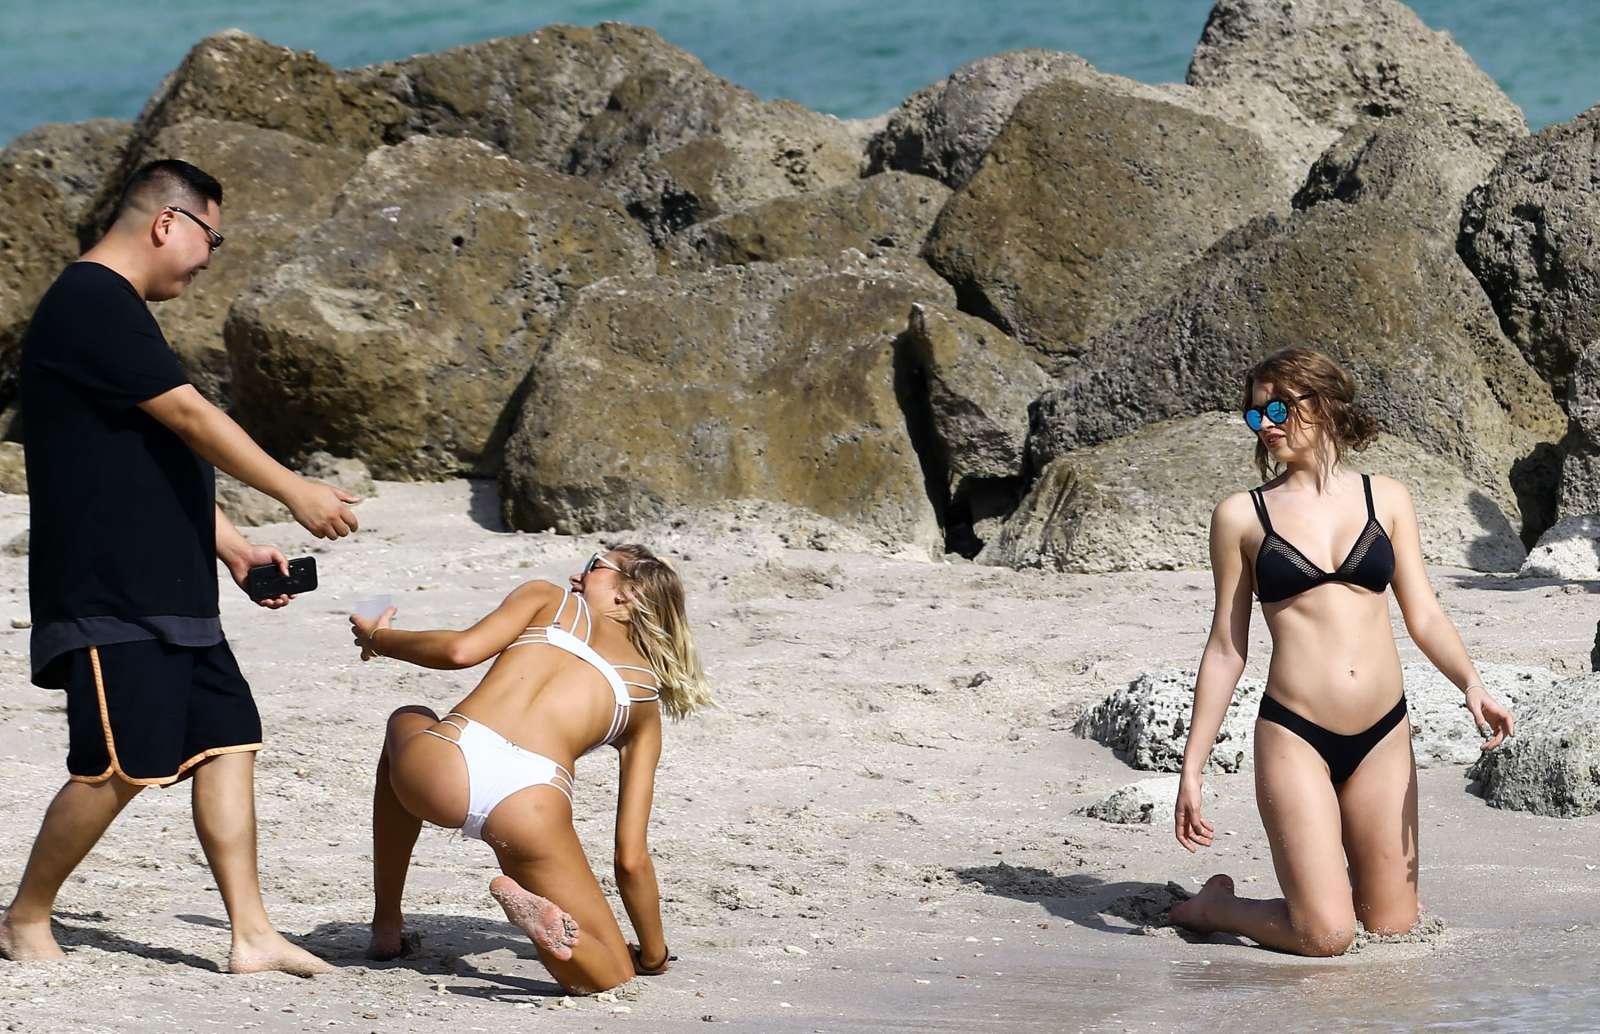 Amanda Kaylor nudes (61 pics), hot Fappening, YouTube, underwear 2017